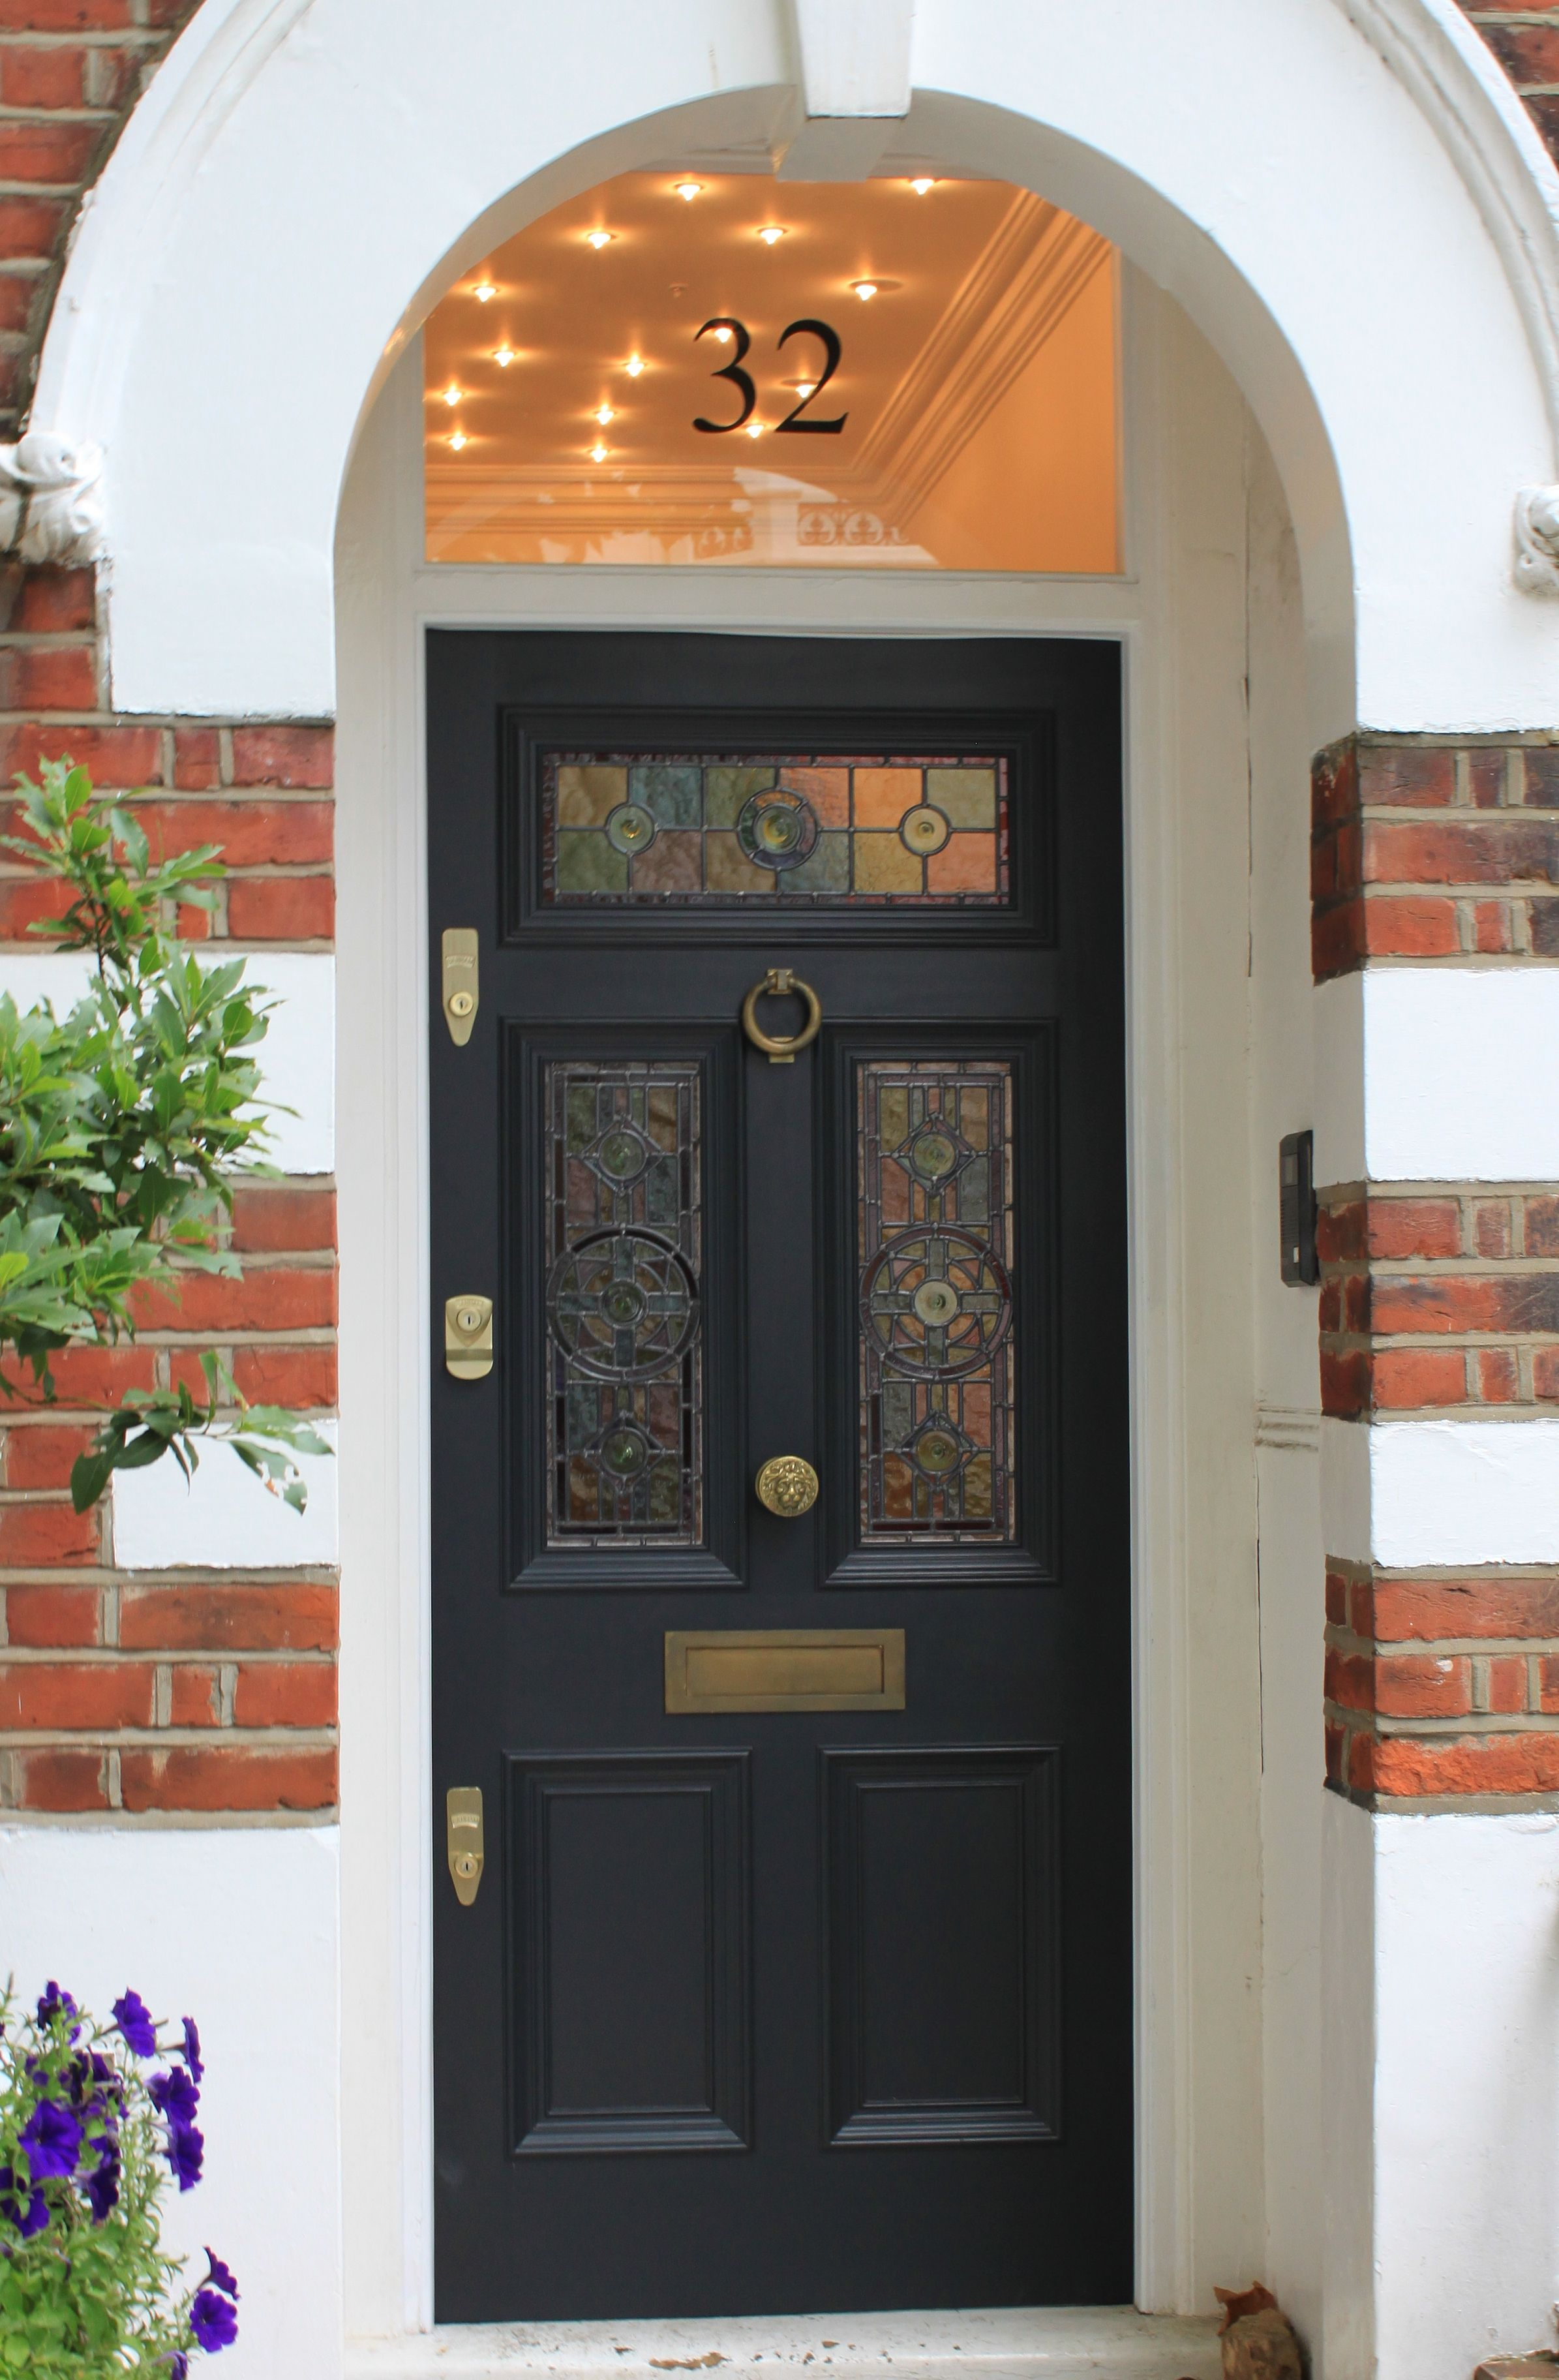 upvc double glazed edwardian front doors - Google Search & upvc double glazed edwardian front doors - Google Search   A ... pezcame.com